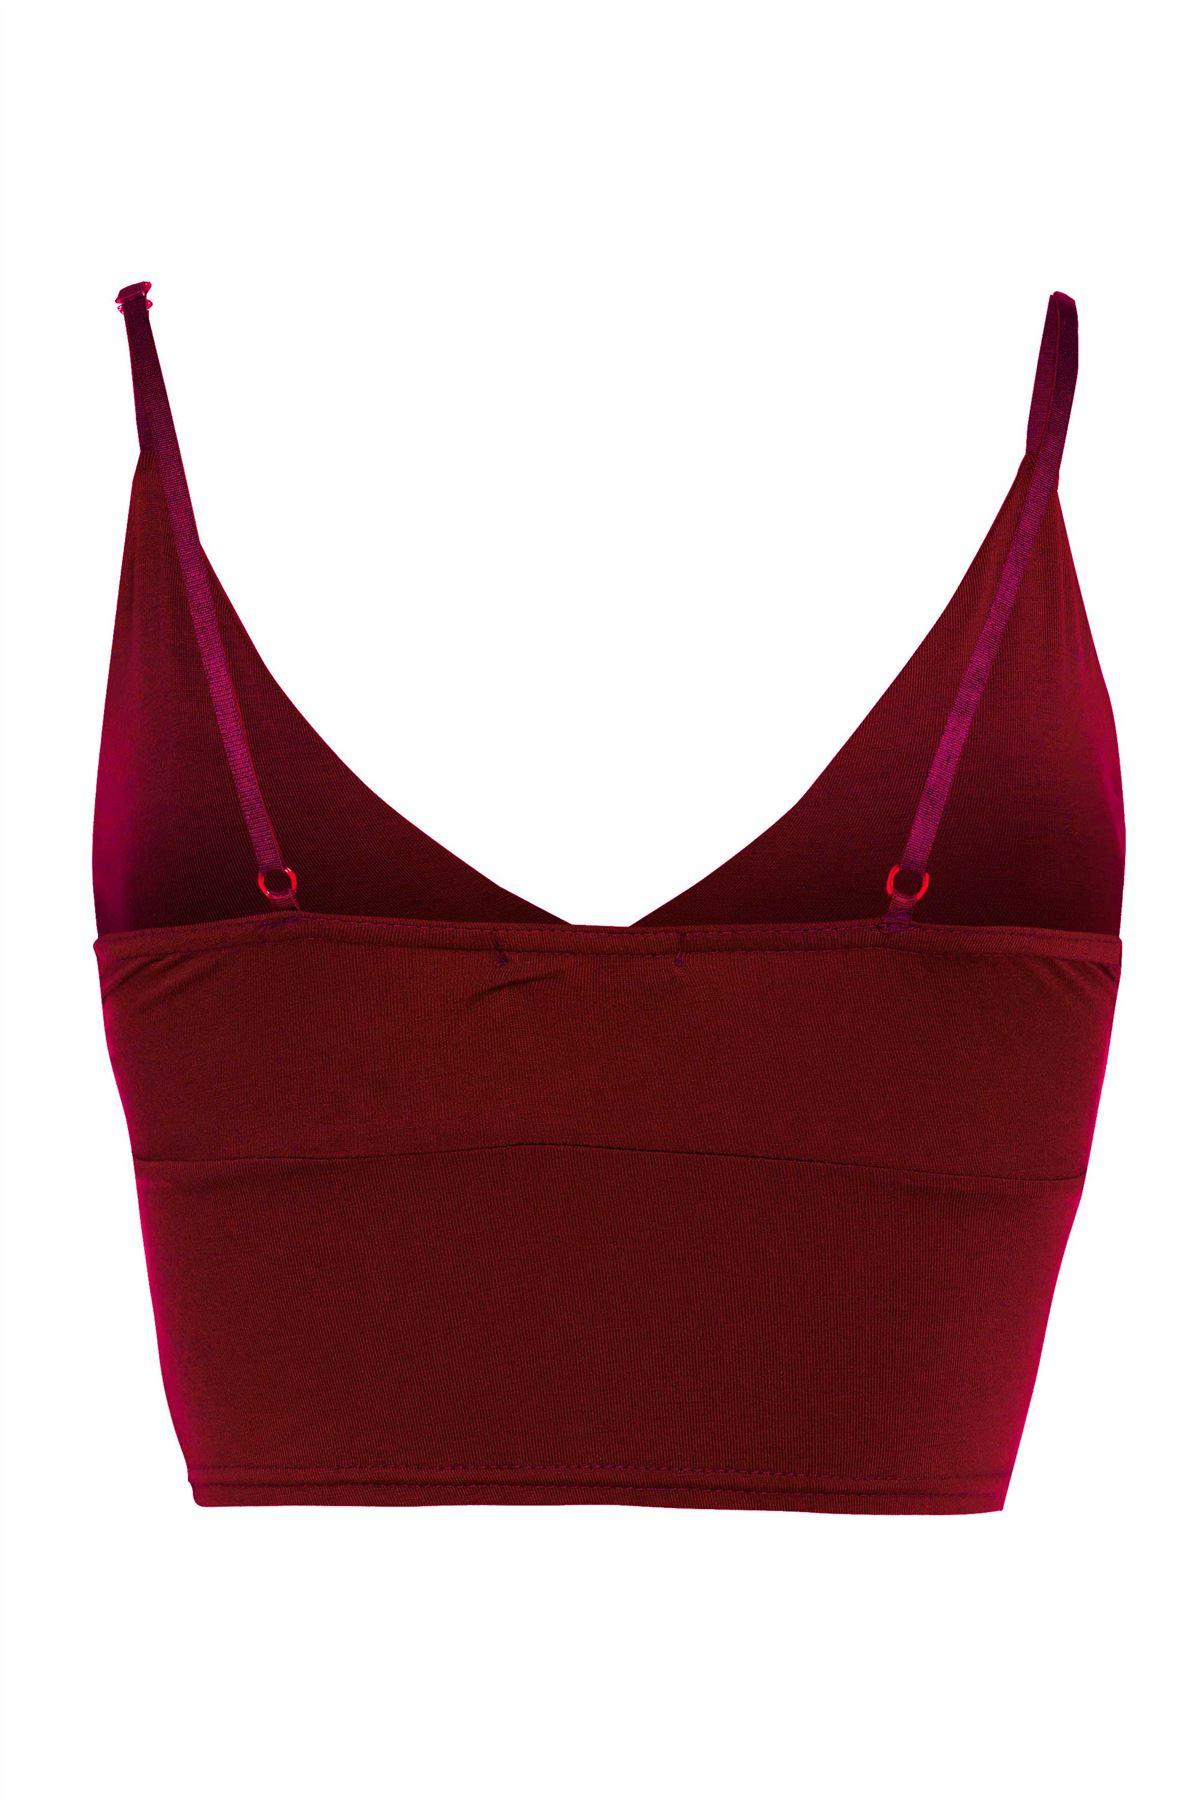 New Ladies Strappy Mini Bralet Crop Bra Vest Tops 8-14